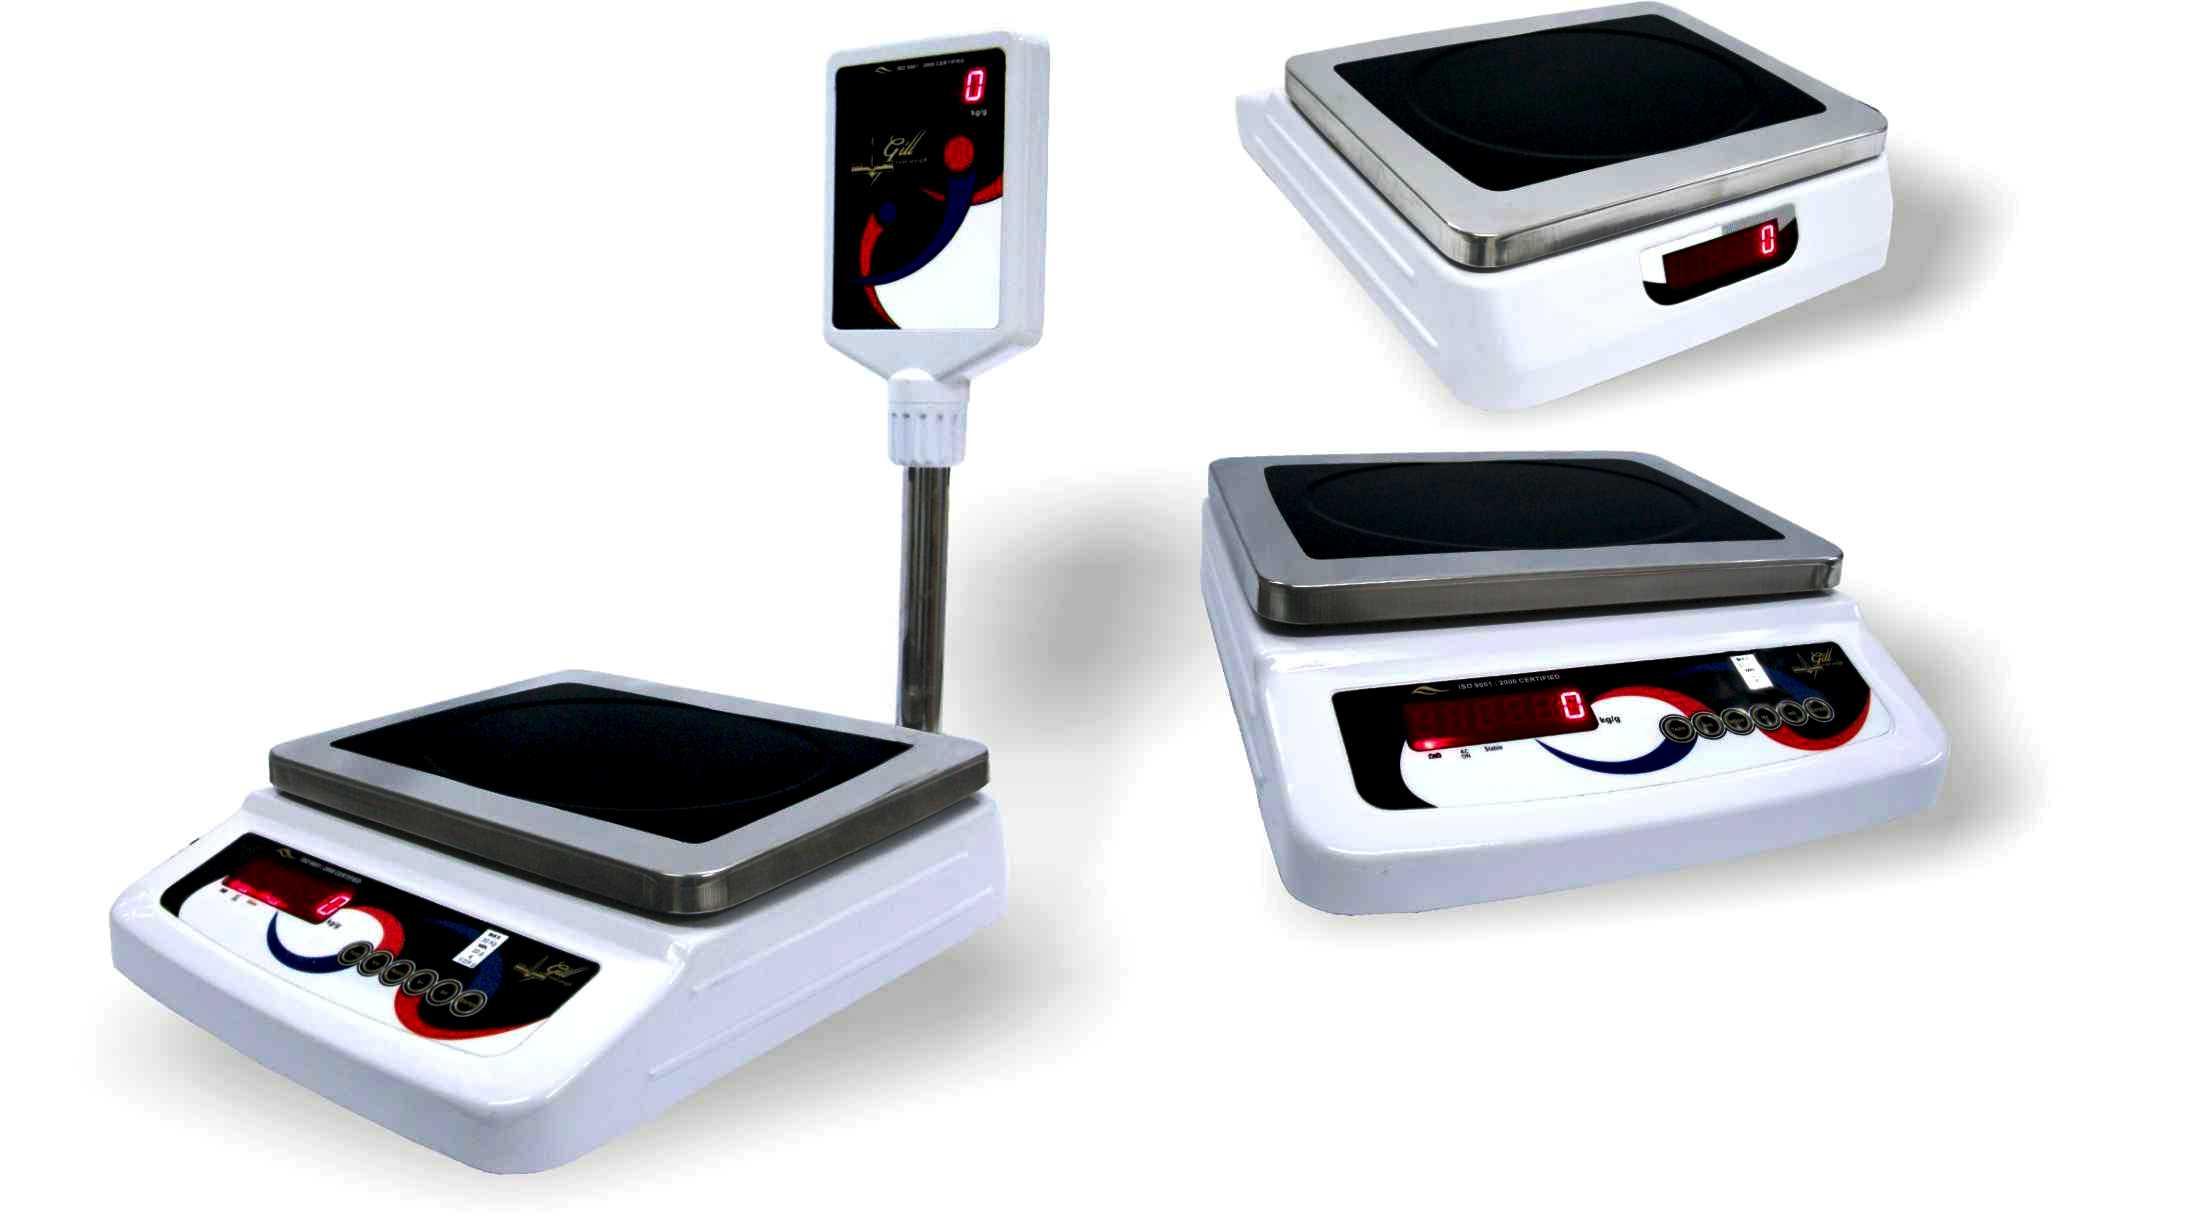 Weighing - Electronic Weighing Scales, Weighing Machines